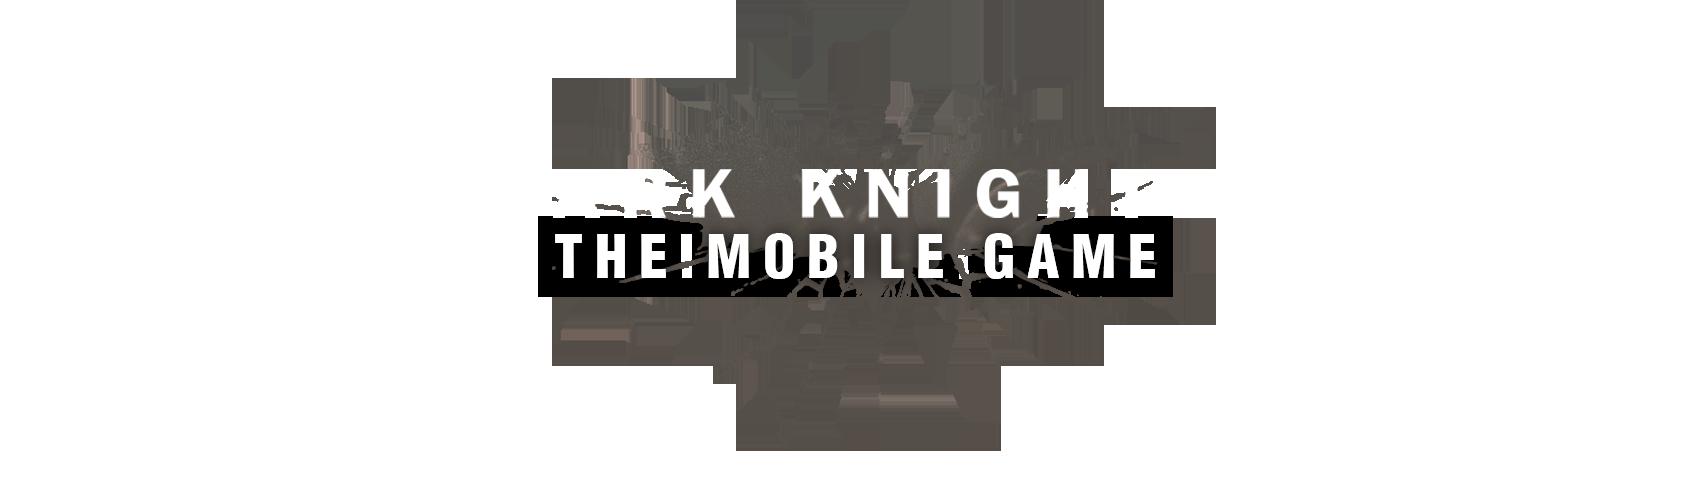 TheDarkKnightRises TheMobileGame Logo 1700x477 EN